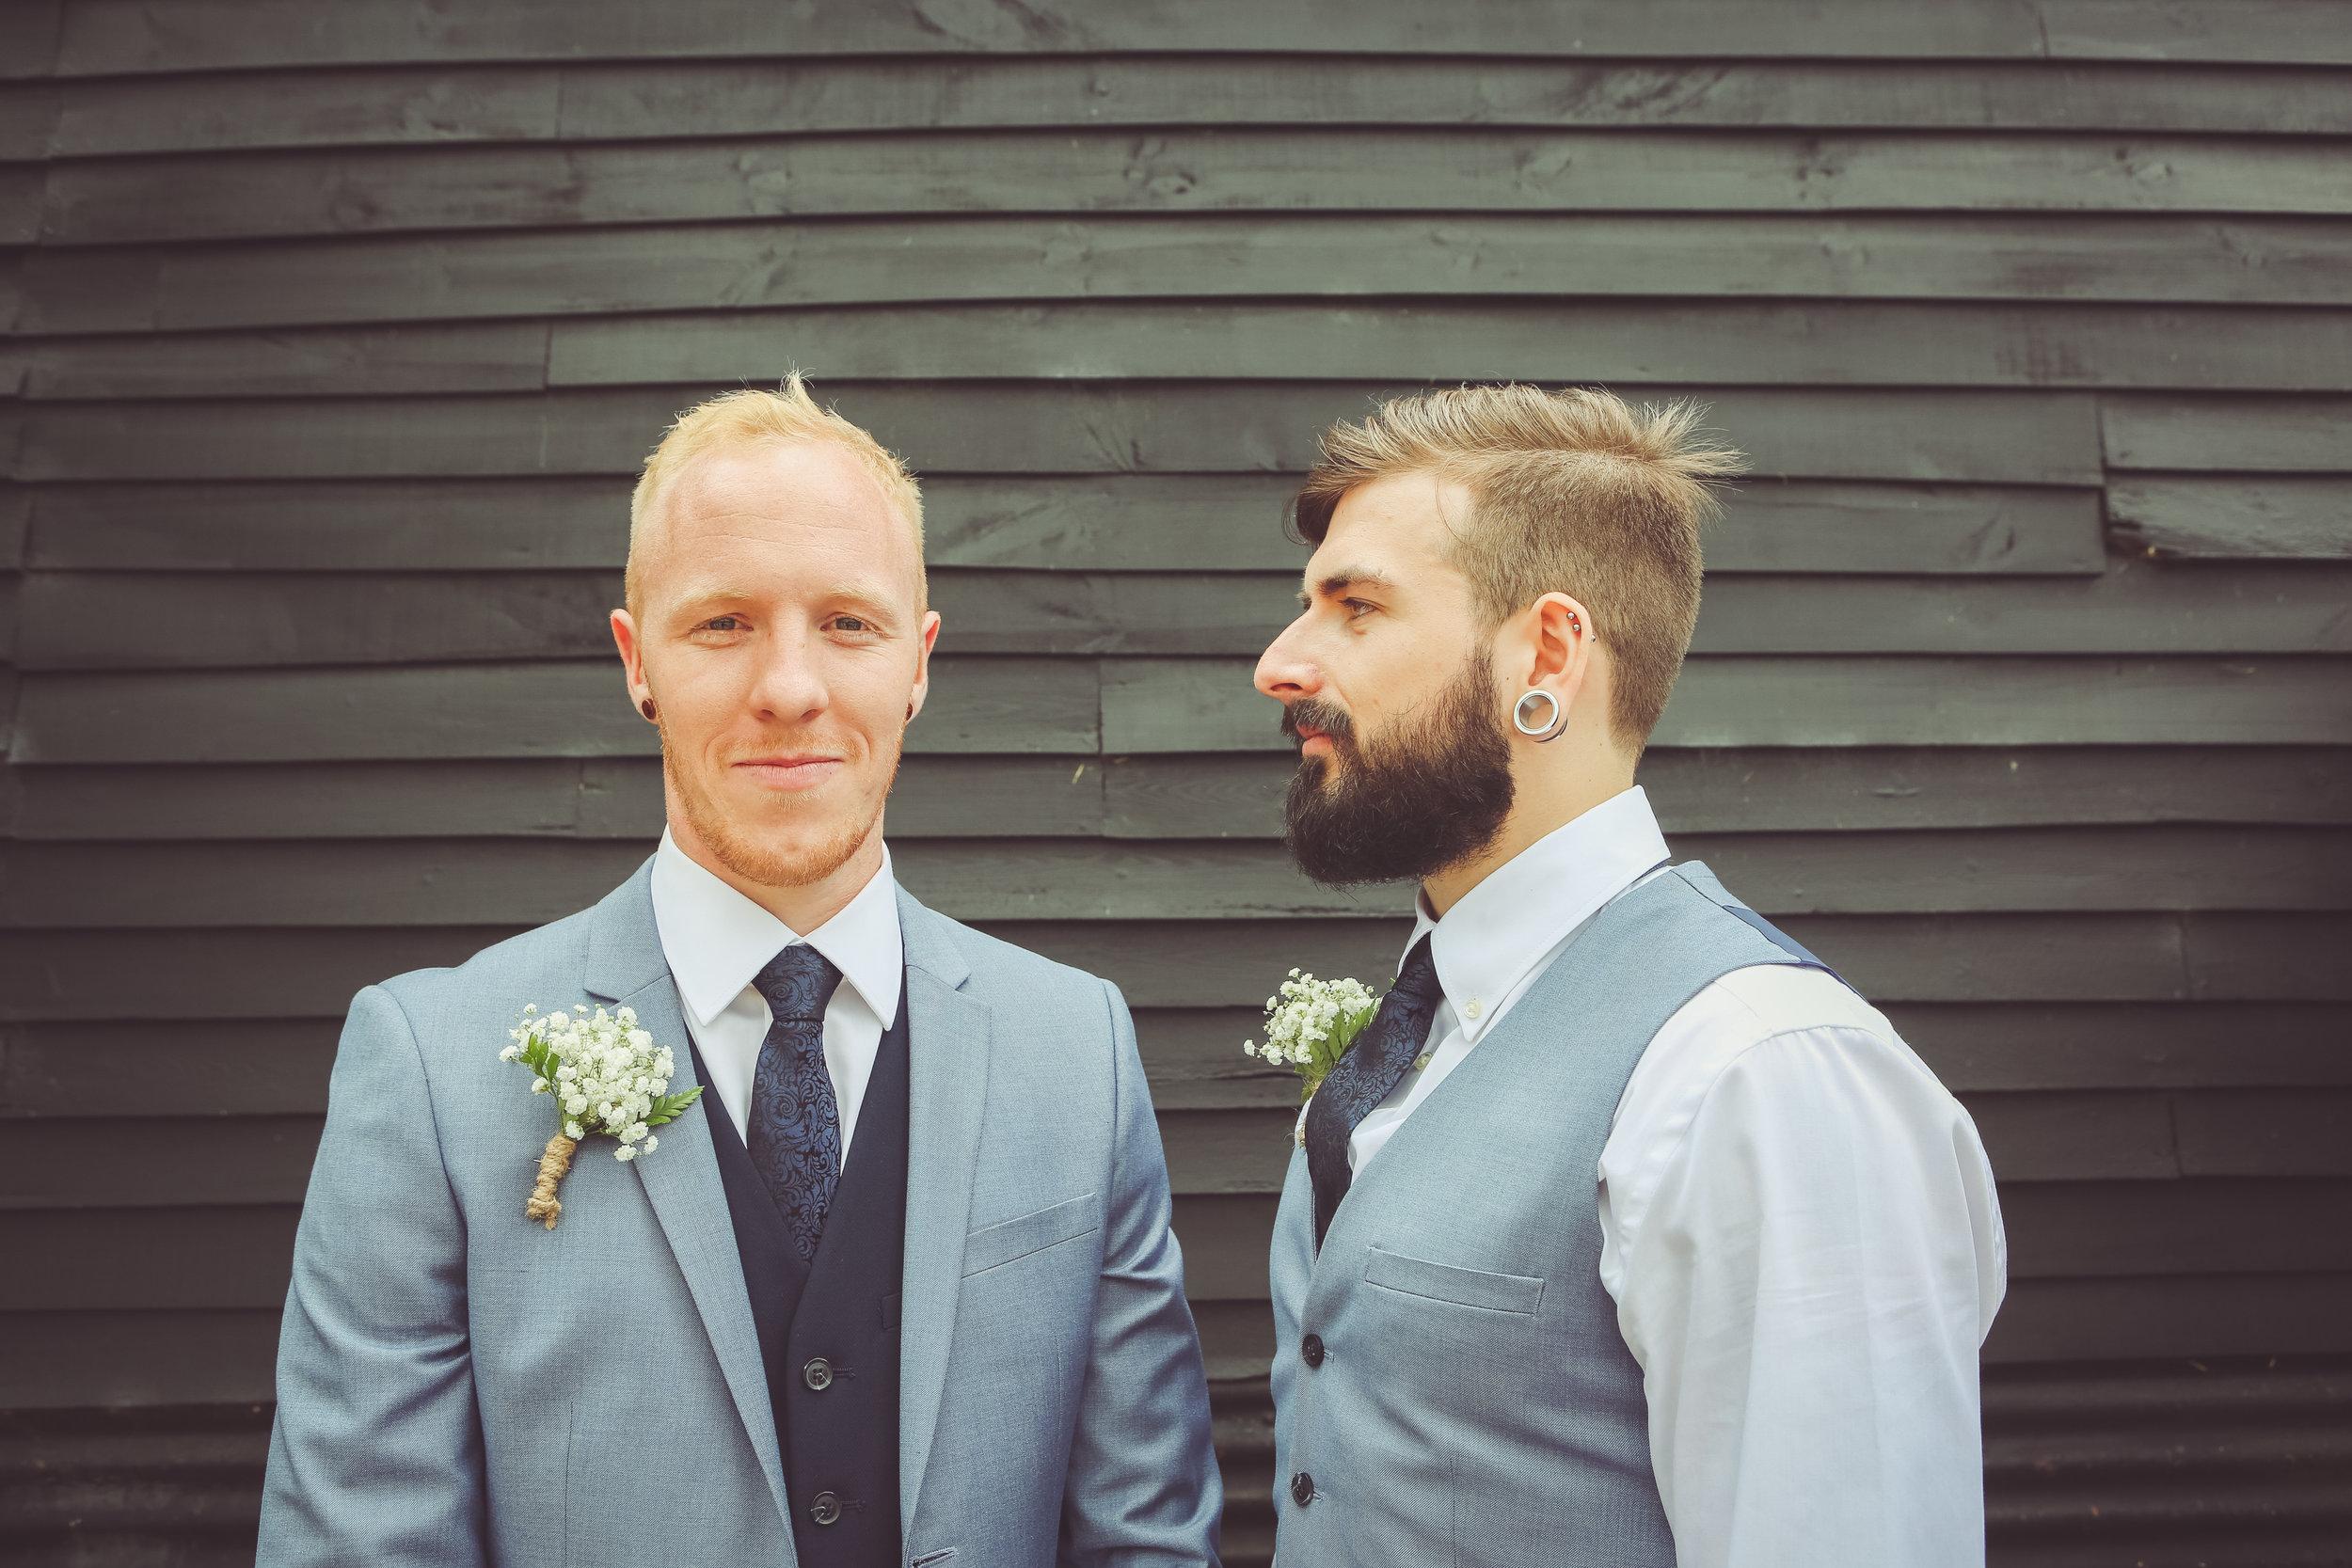 Amy & Adam Wedding - July 2nd 2016 Sussex BarnAmy & Adam Wedding - Sussex BarnFRNH1815.jpg